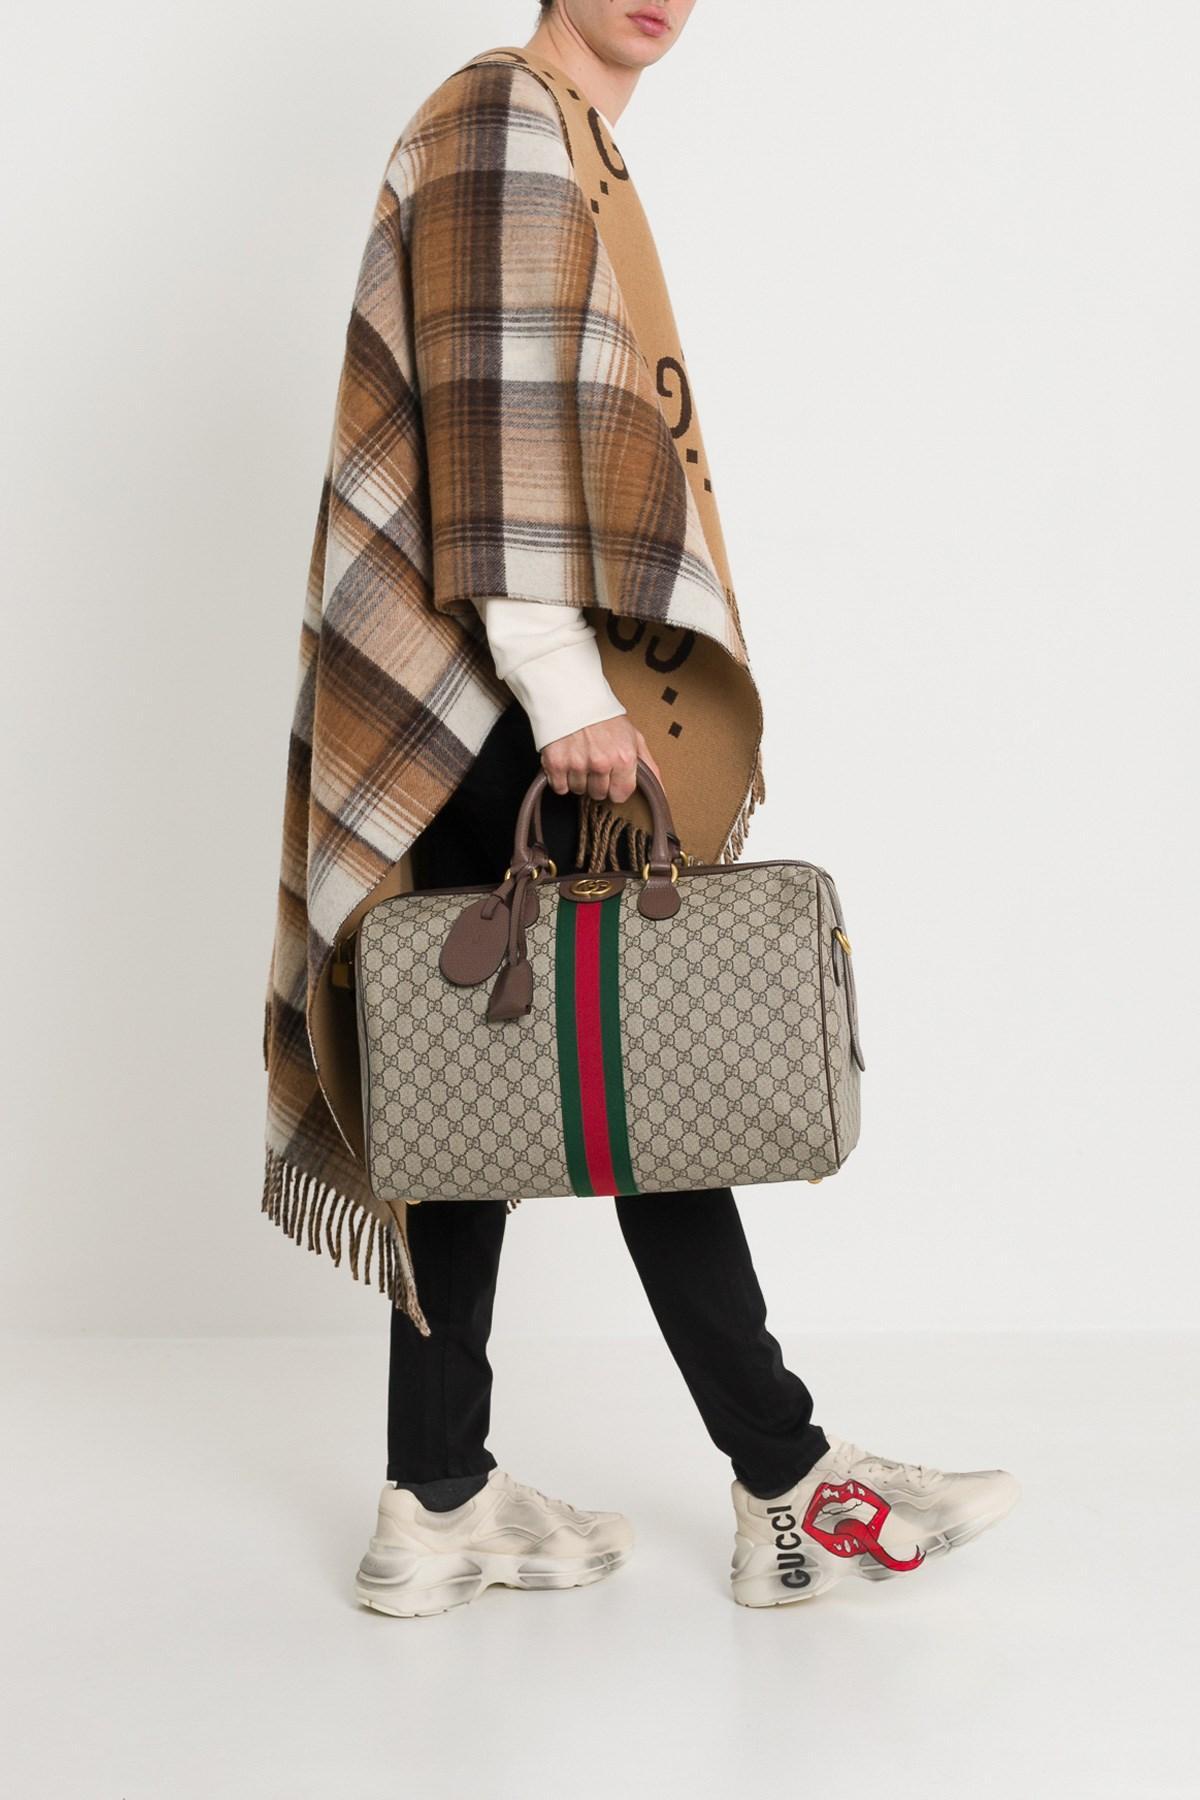 fd866b567ec1 Gucci Ophidia Gg Medium Carry-on Duffle for Men - Lyst